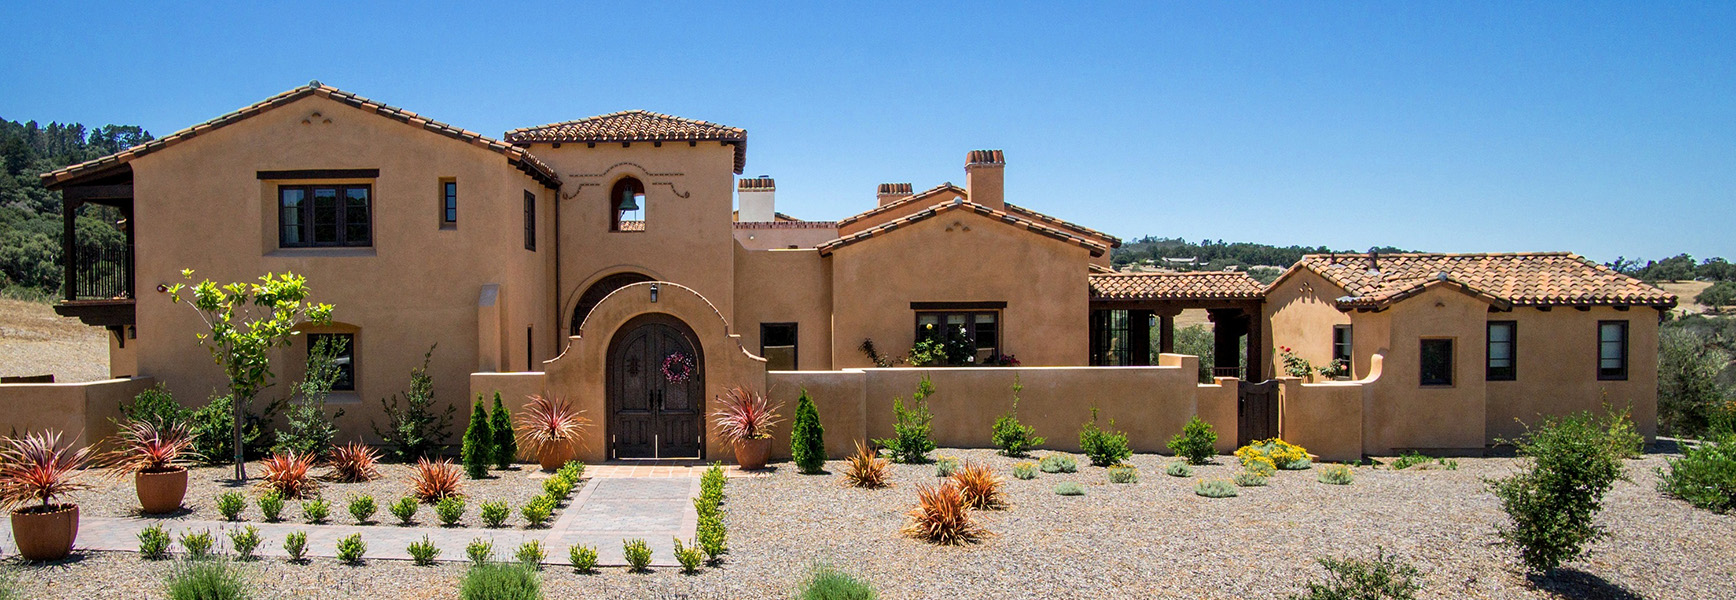 2 Kraft Residence - exterior-spanish hacienda with bell tower.jpg